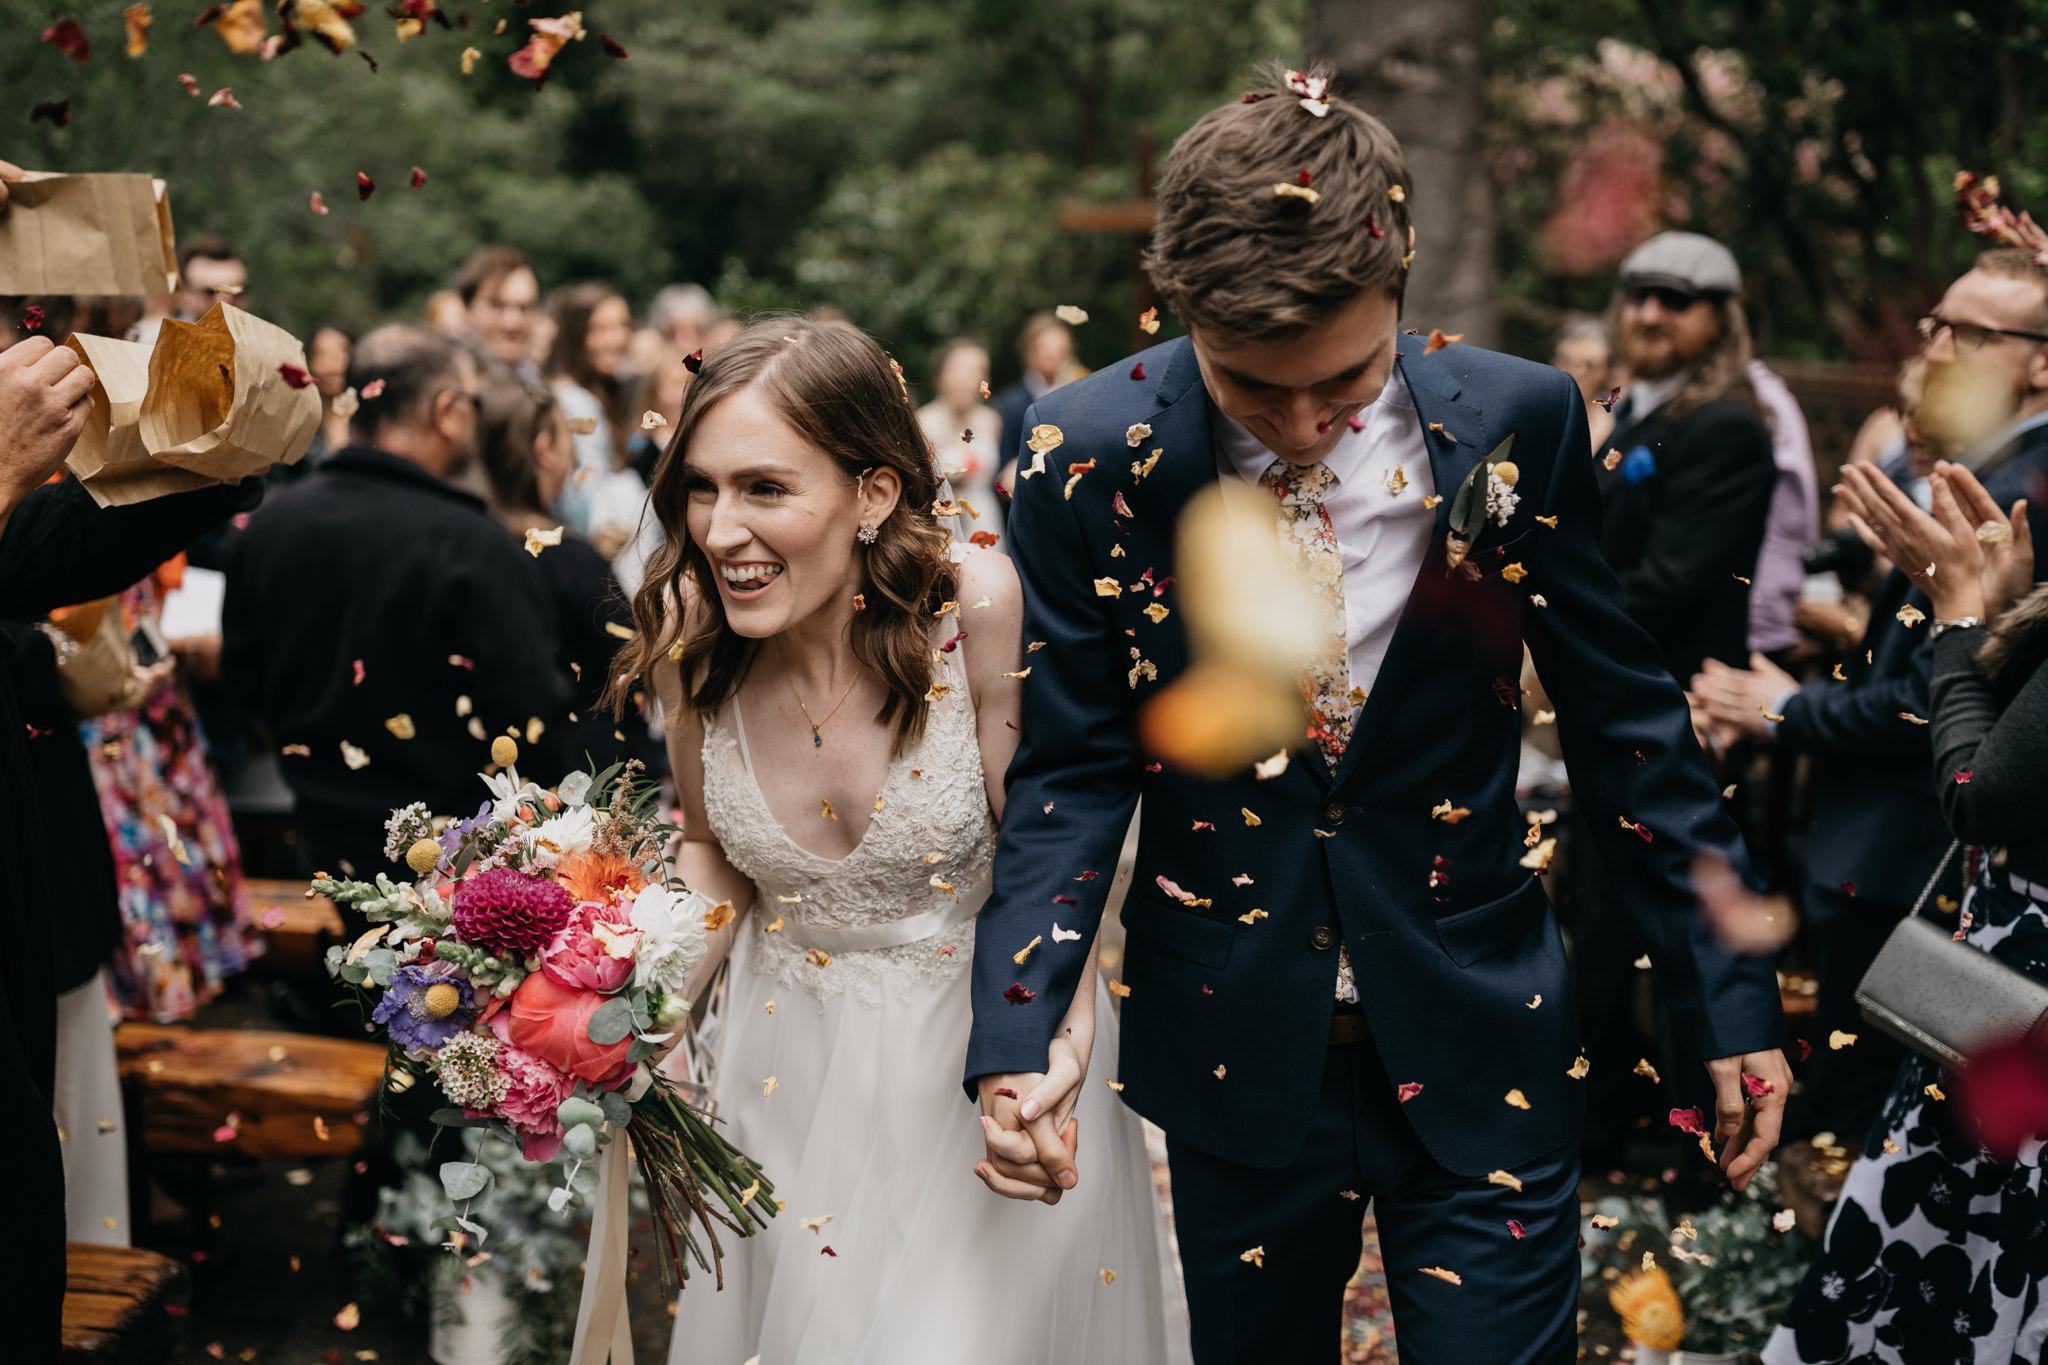 Liam & Lauren's Wedding - Photography by Story Studio.